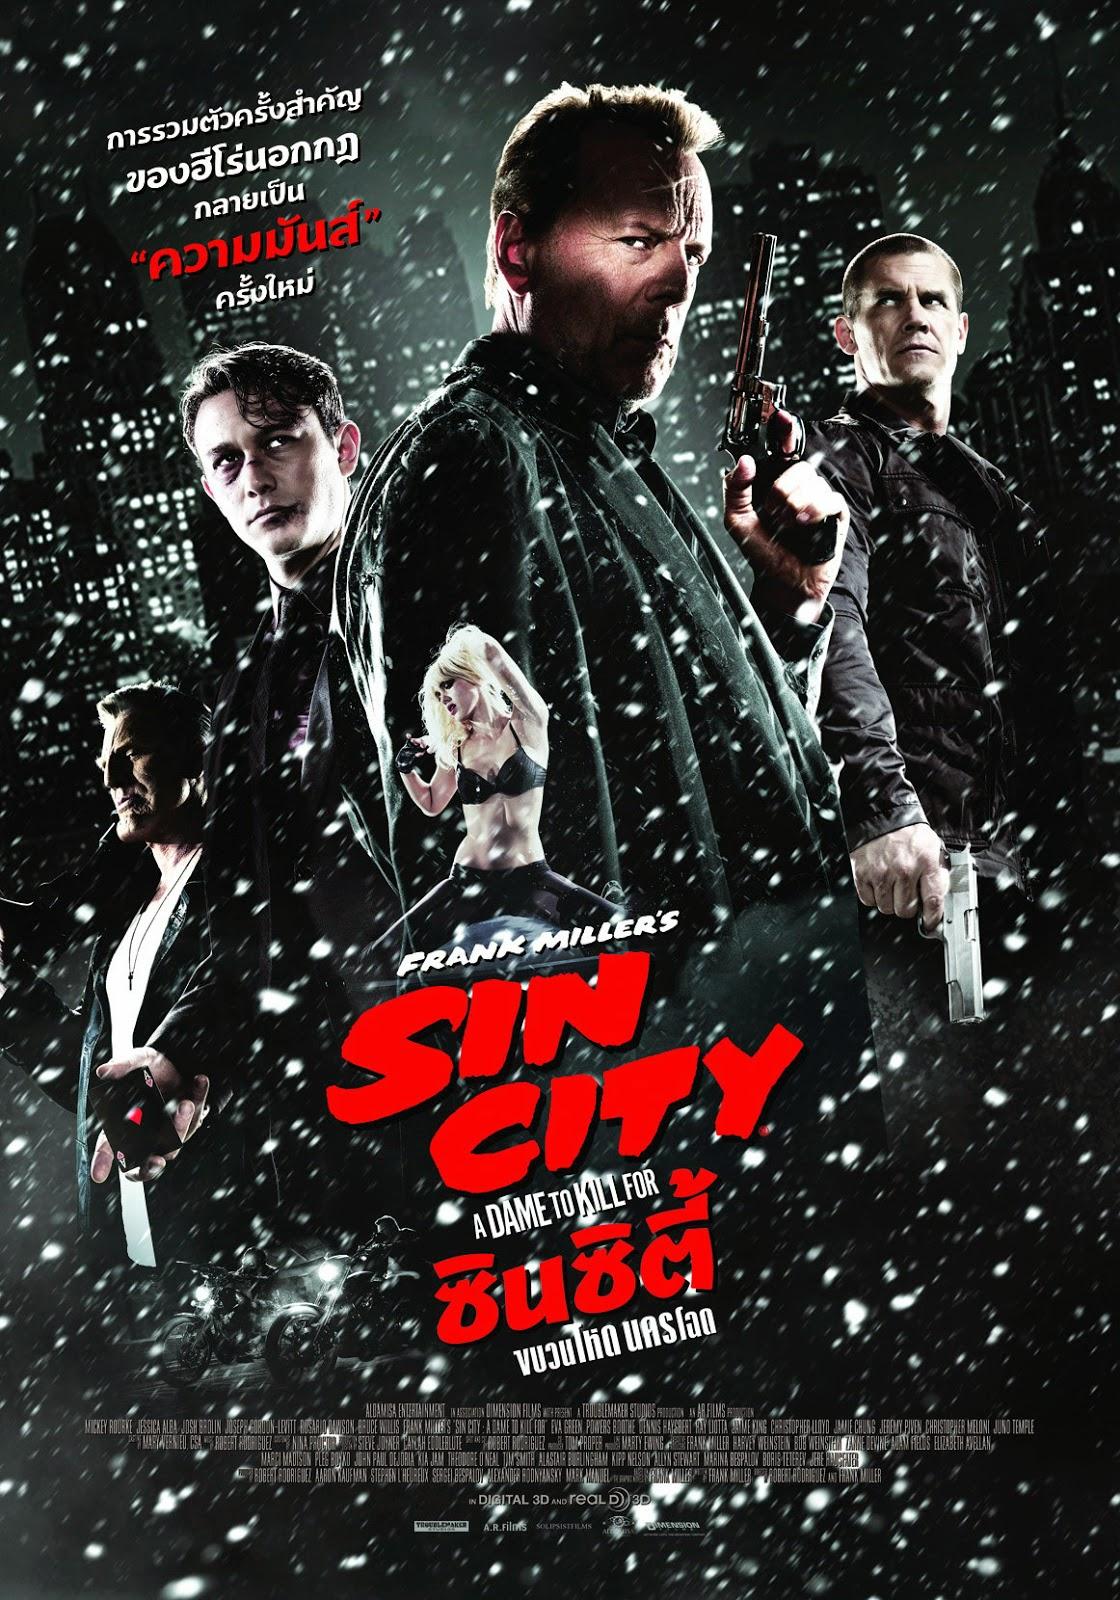 Sin City : A Dame to Kill For (2014) ซินซิตี้ ขบวนโหด นครโฉด